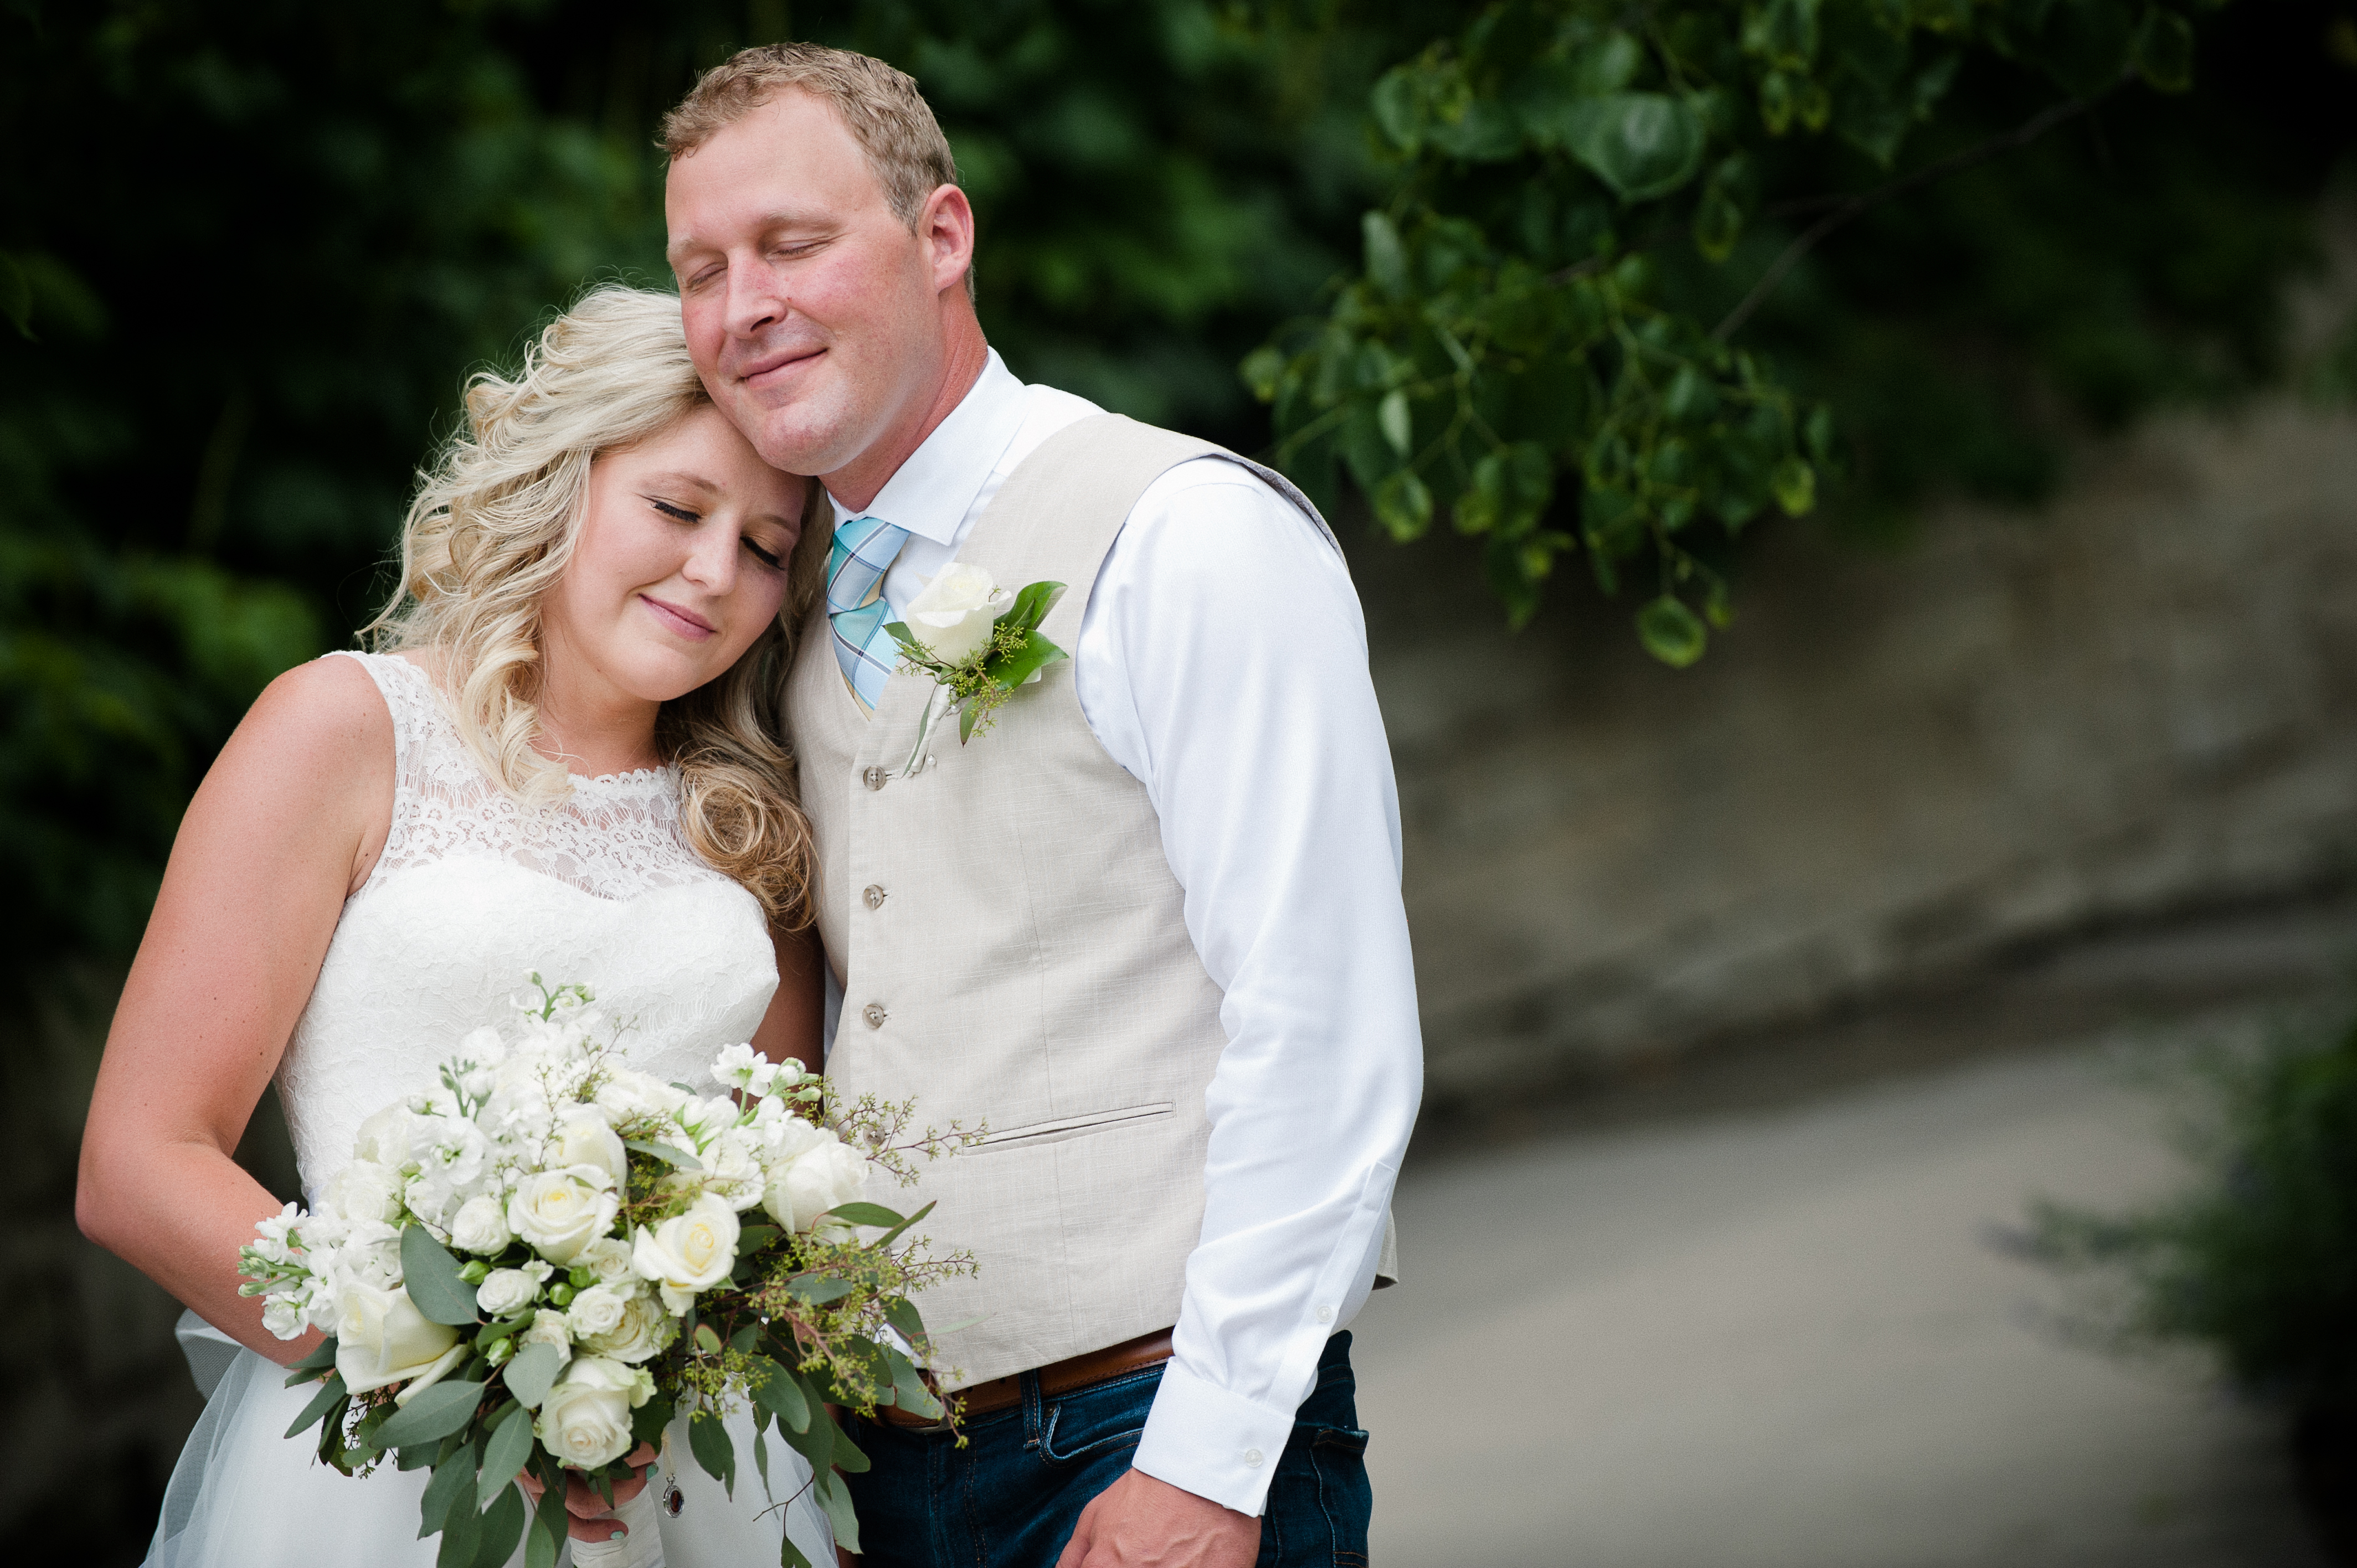 lauritzen gardens wedding - photo #20